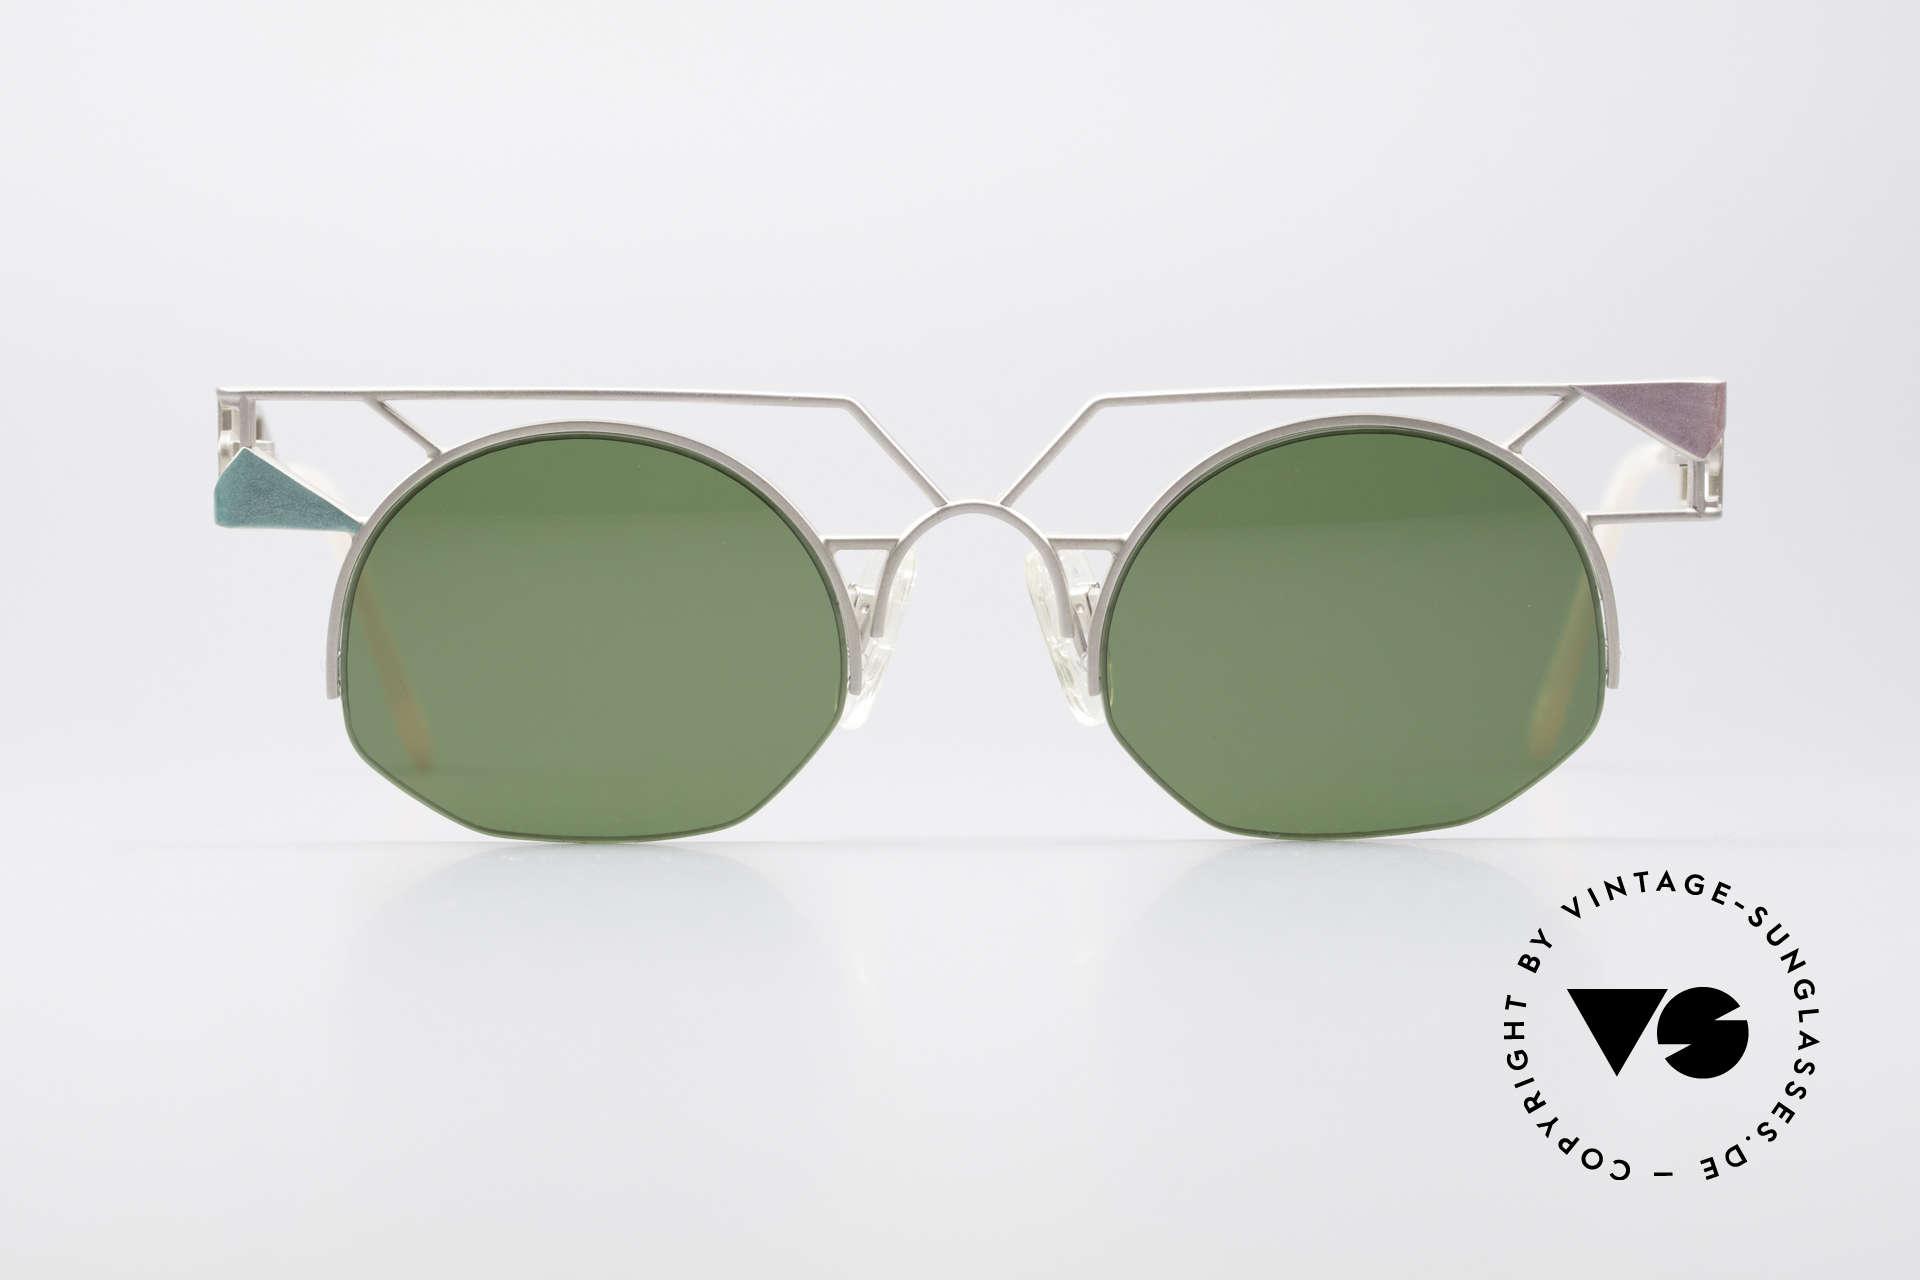 ec09fc2f83 Sunglasses Neostyle Jet 224 Futuristic Vintage Glasses